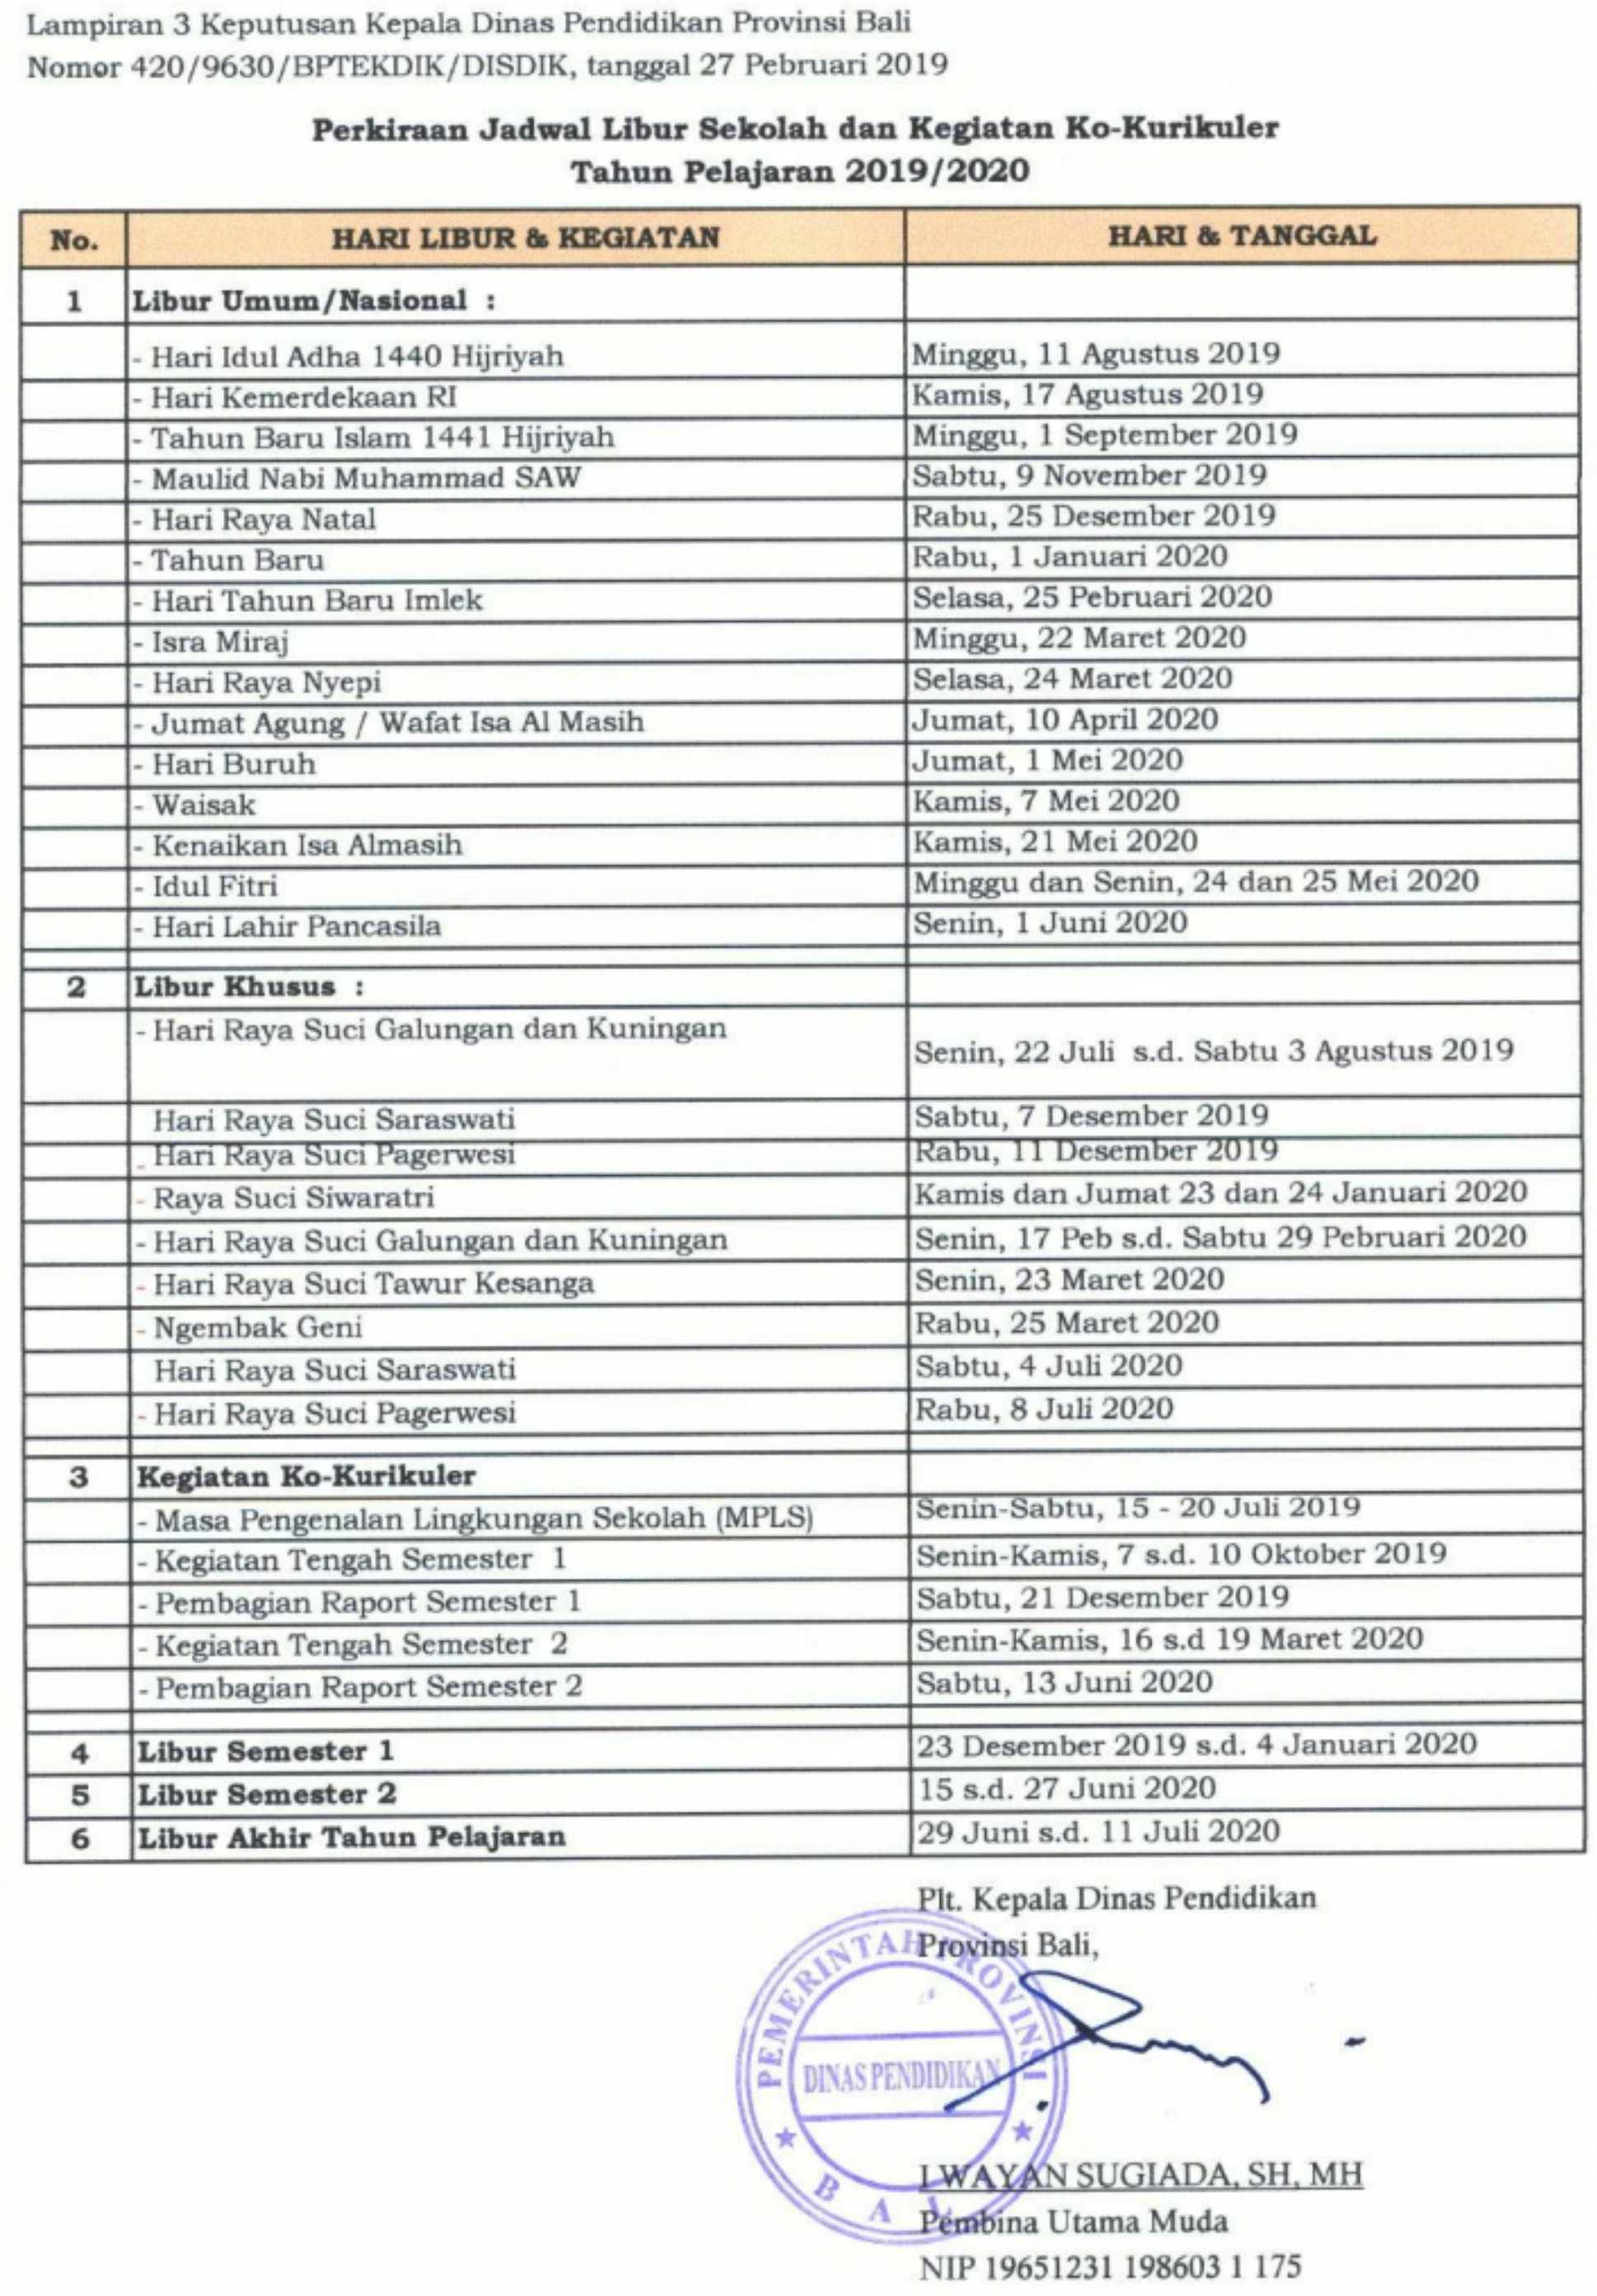 Perkiraan jadwal libur sekolah dan kegiatan ko-kurikuler tahun pelajaran 2019-2020